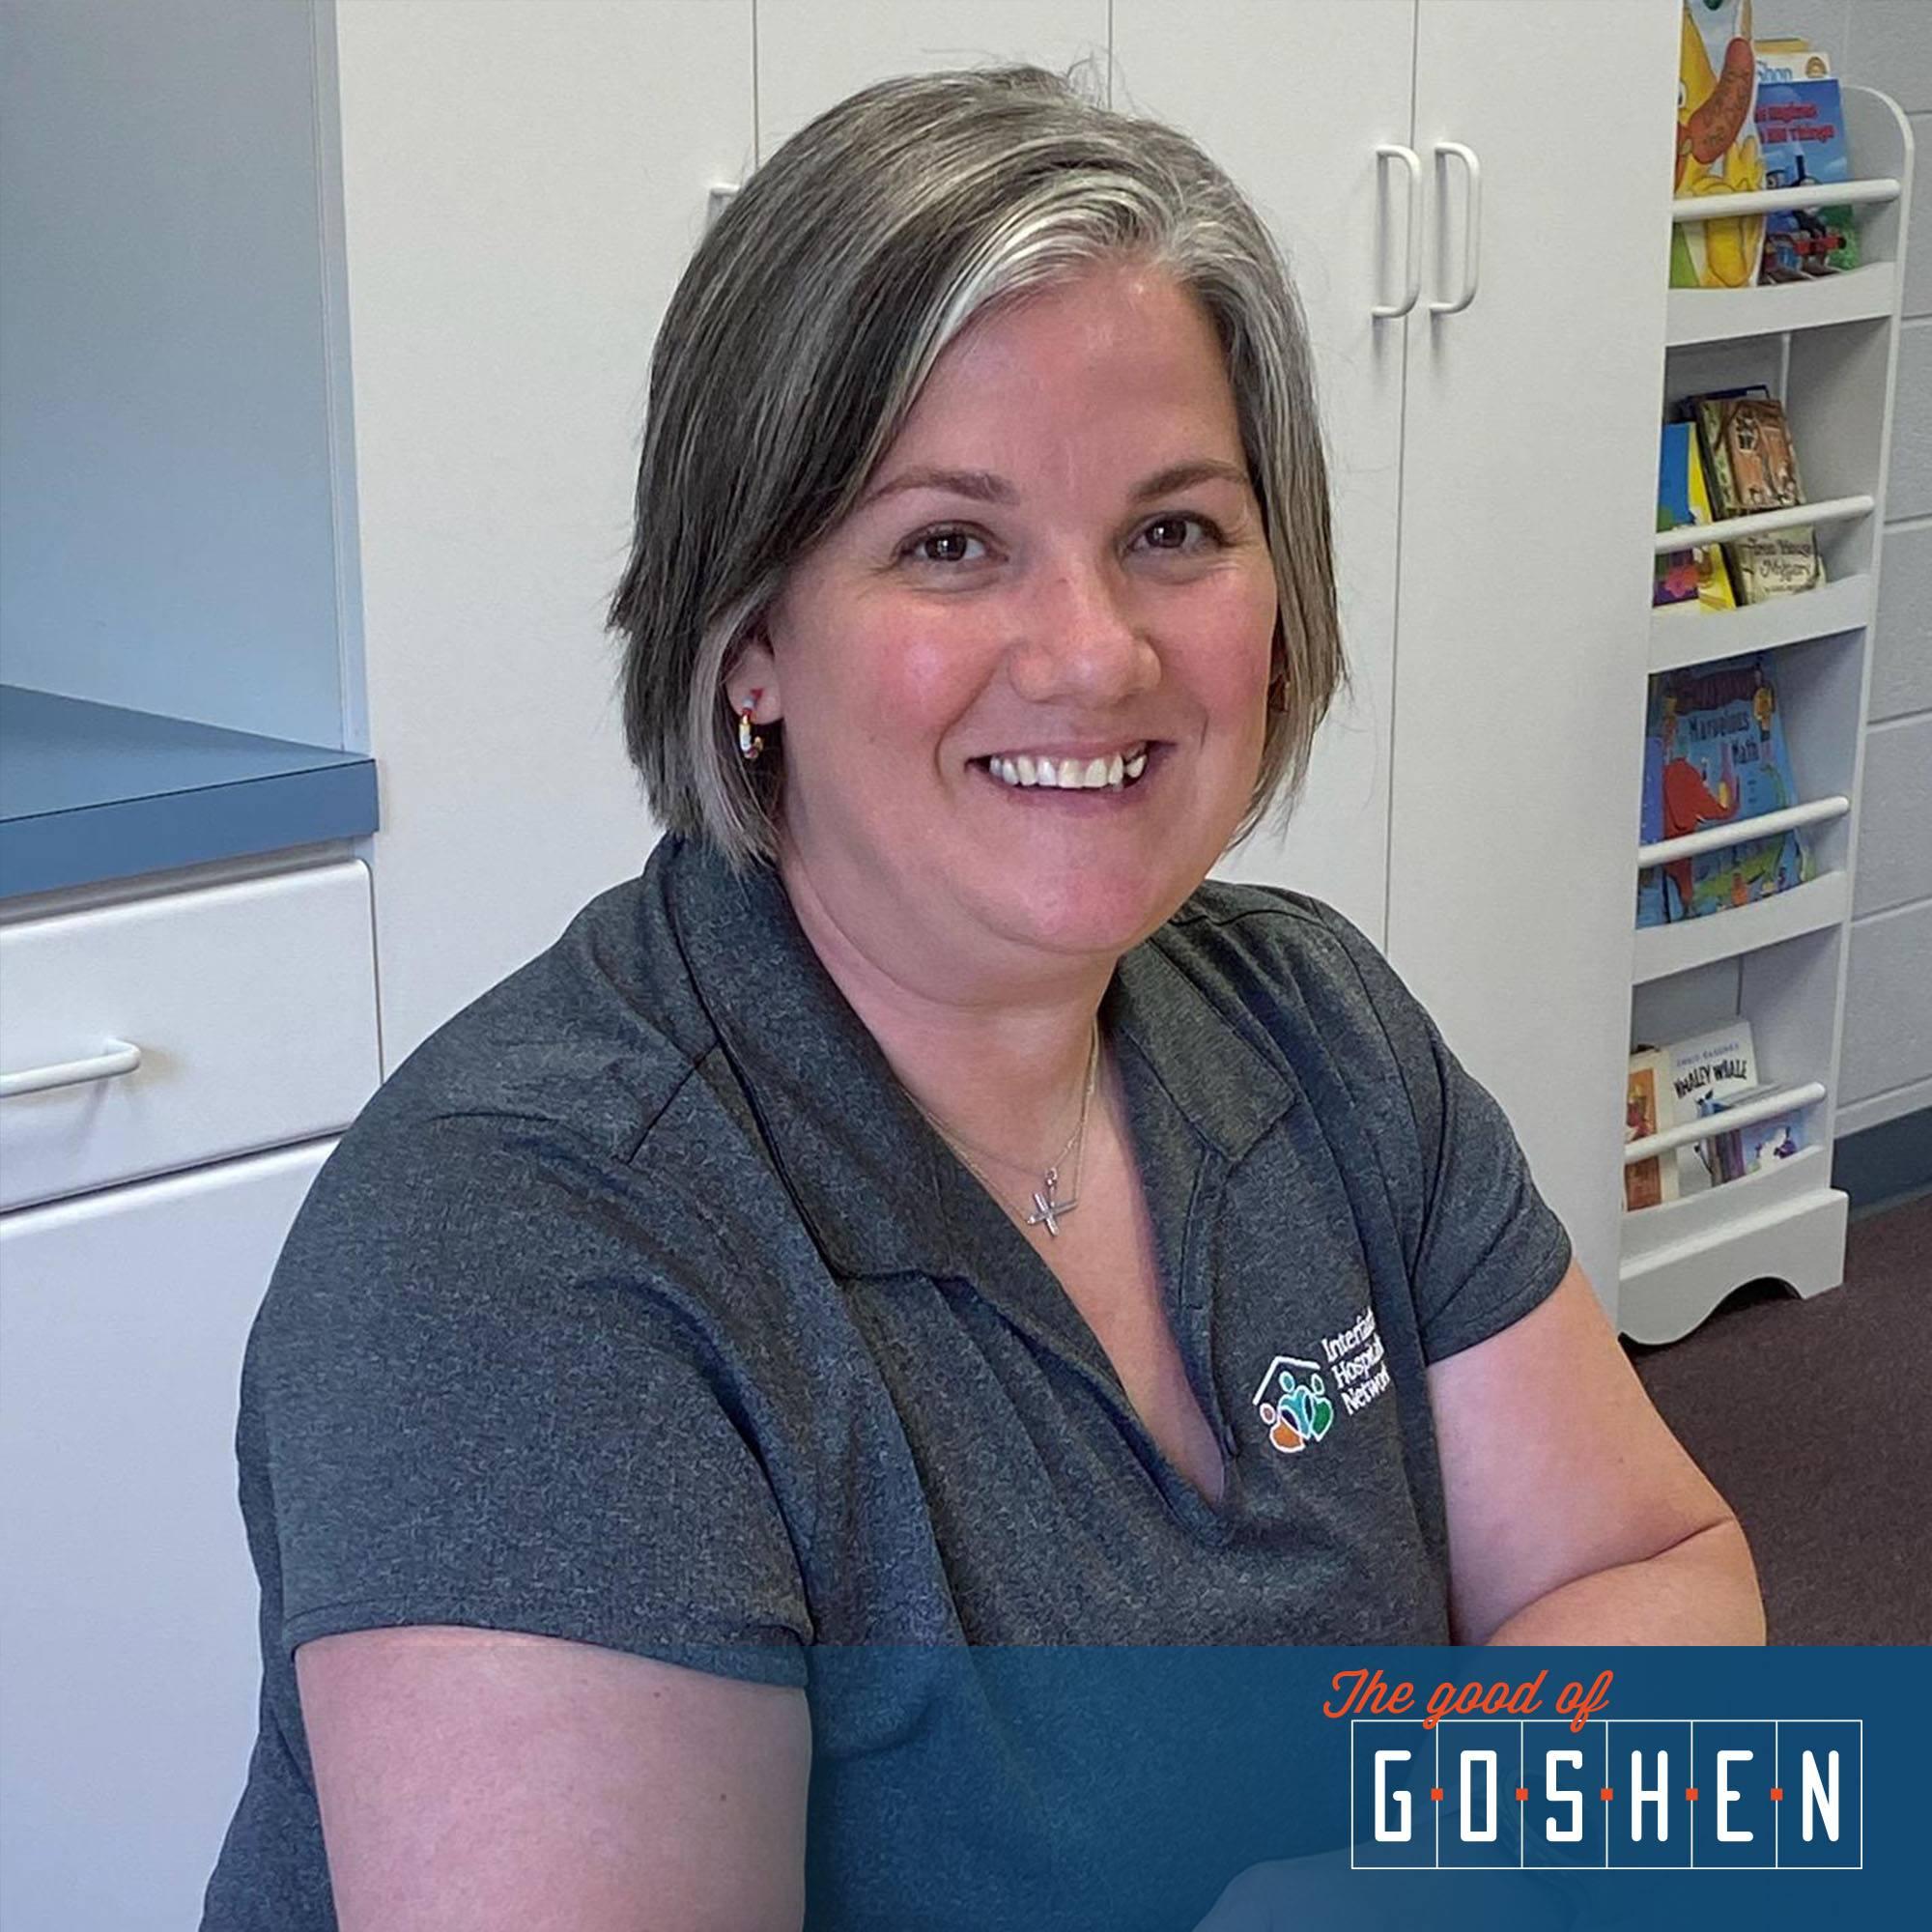 Mindy Morehead • The Good of Goshen